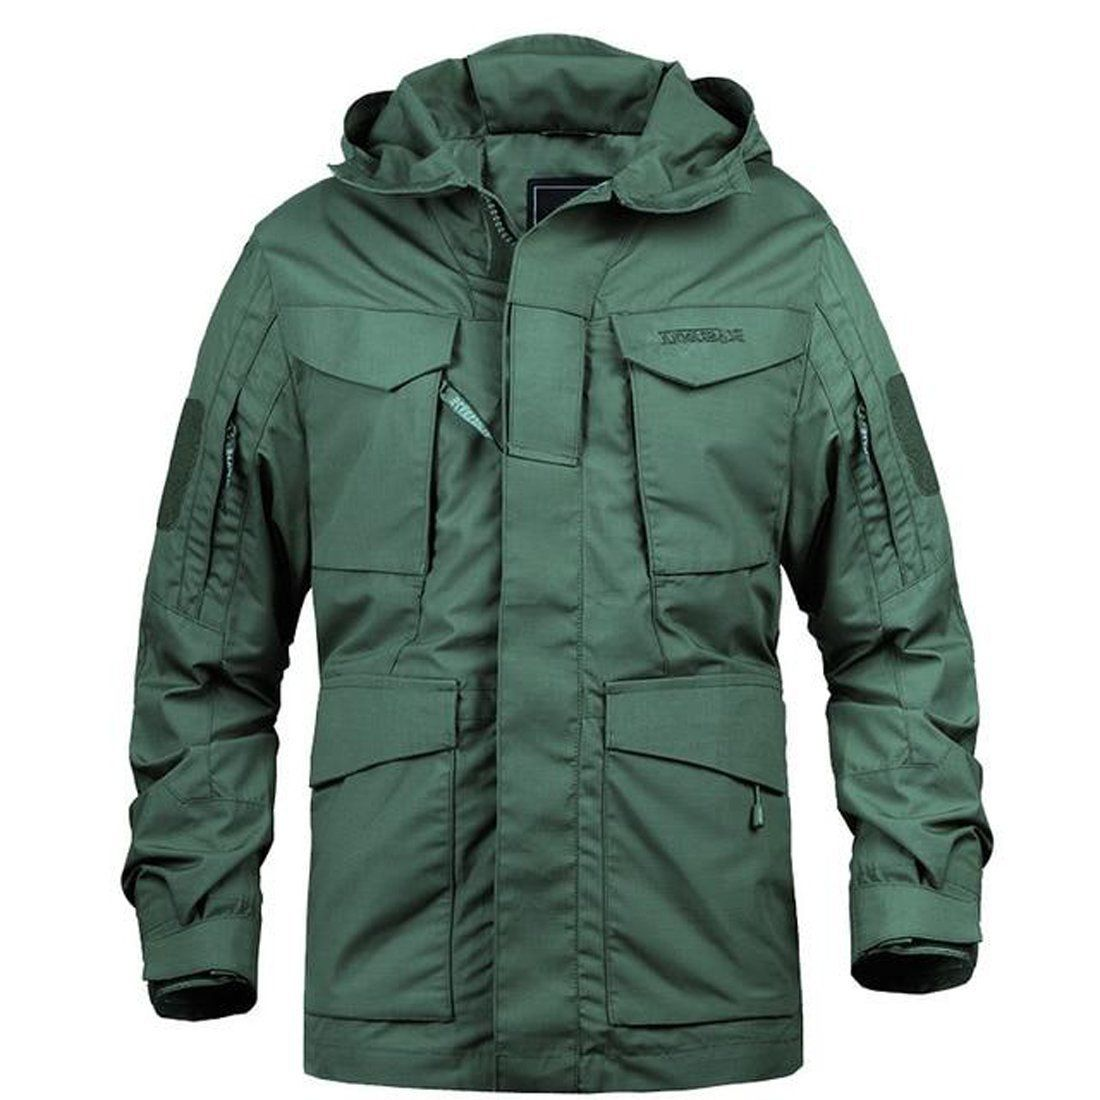 Men's Jacket Military Camouflage Windbreaker Hooded